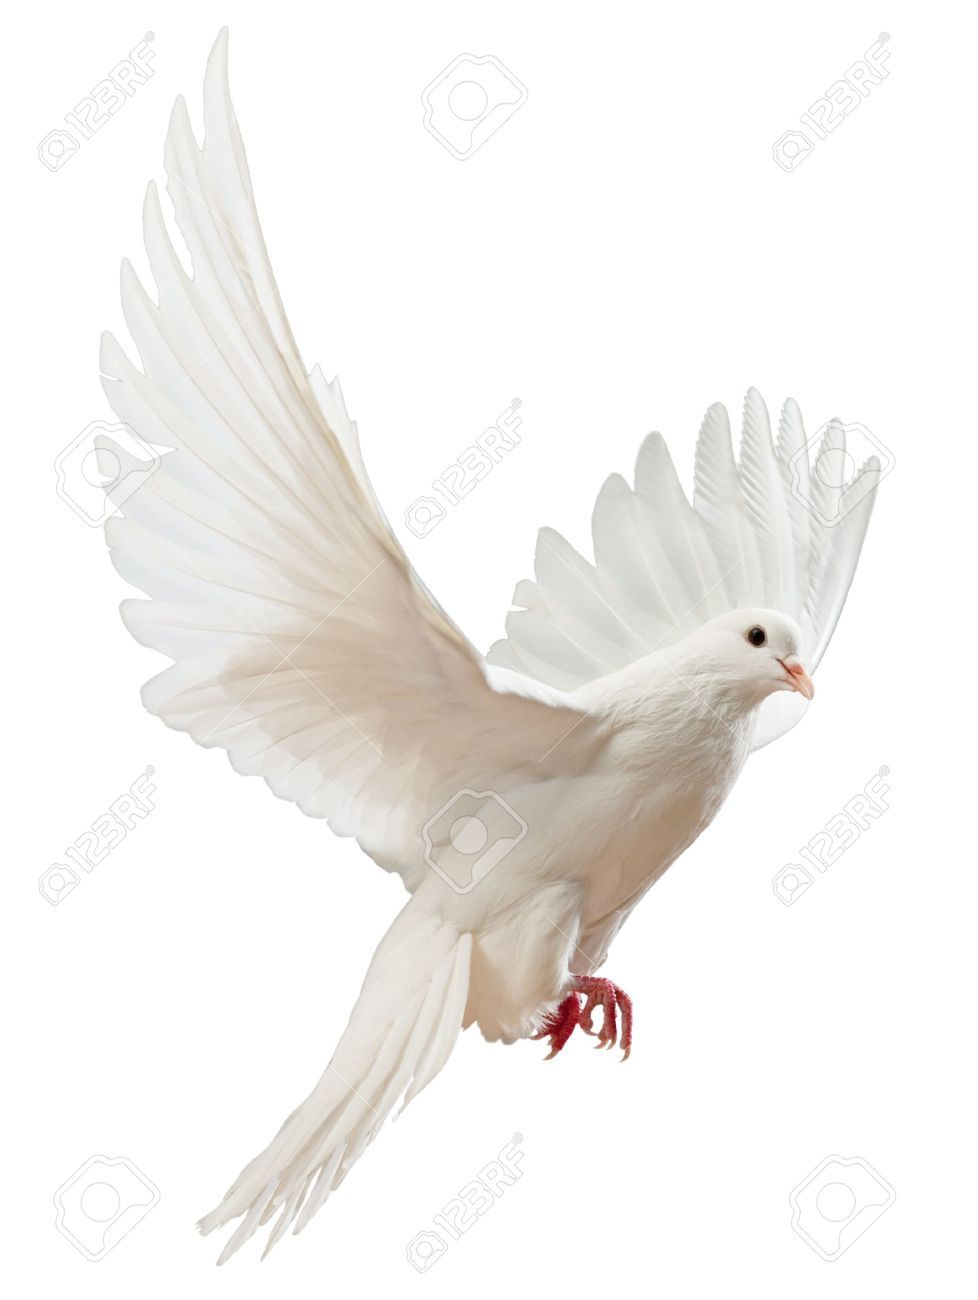 Suvisiaci Obrazok Dove Pictures White Doves Black Background Images